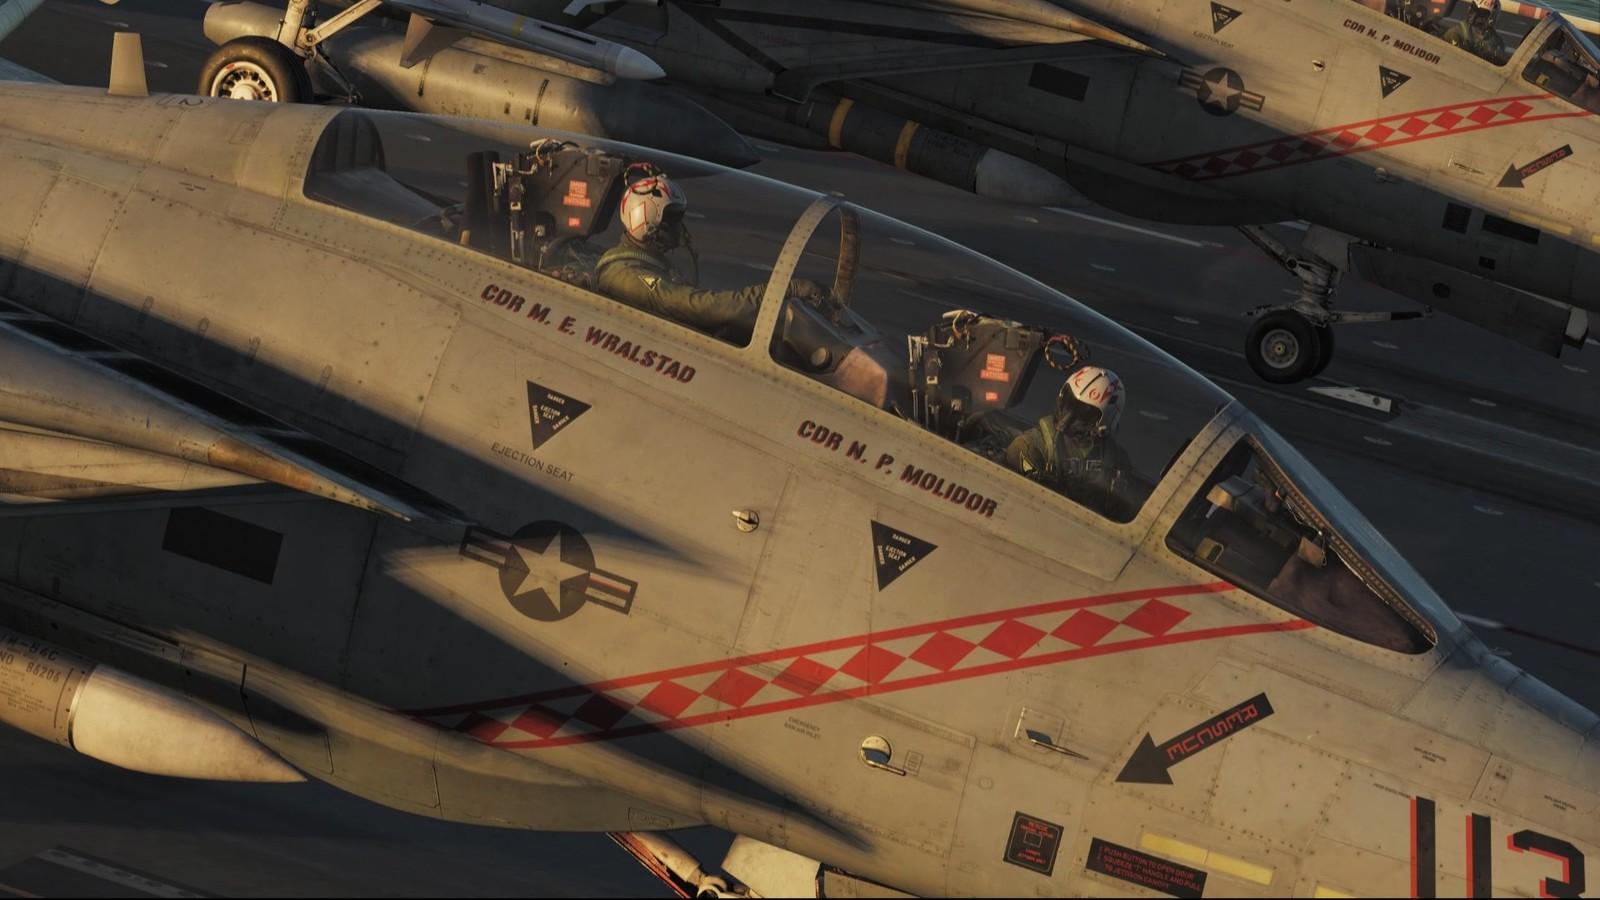 Finally! F-14 pilots in their cockpit. Pretty beautiful shot.